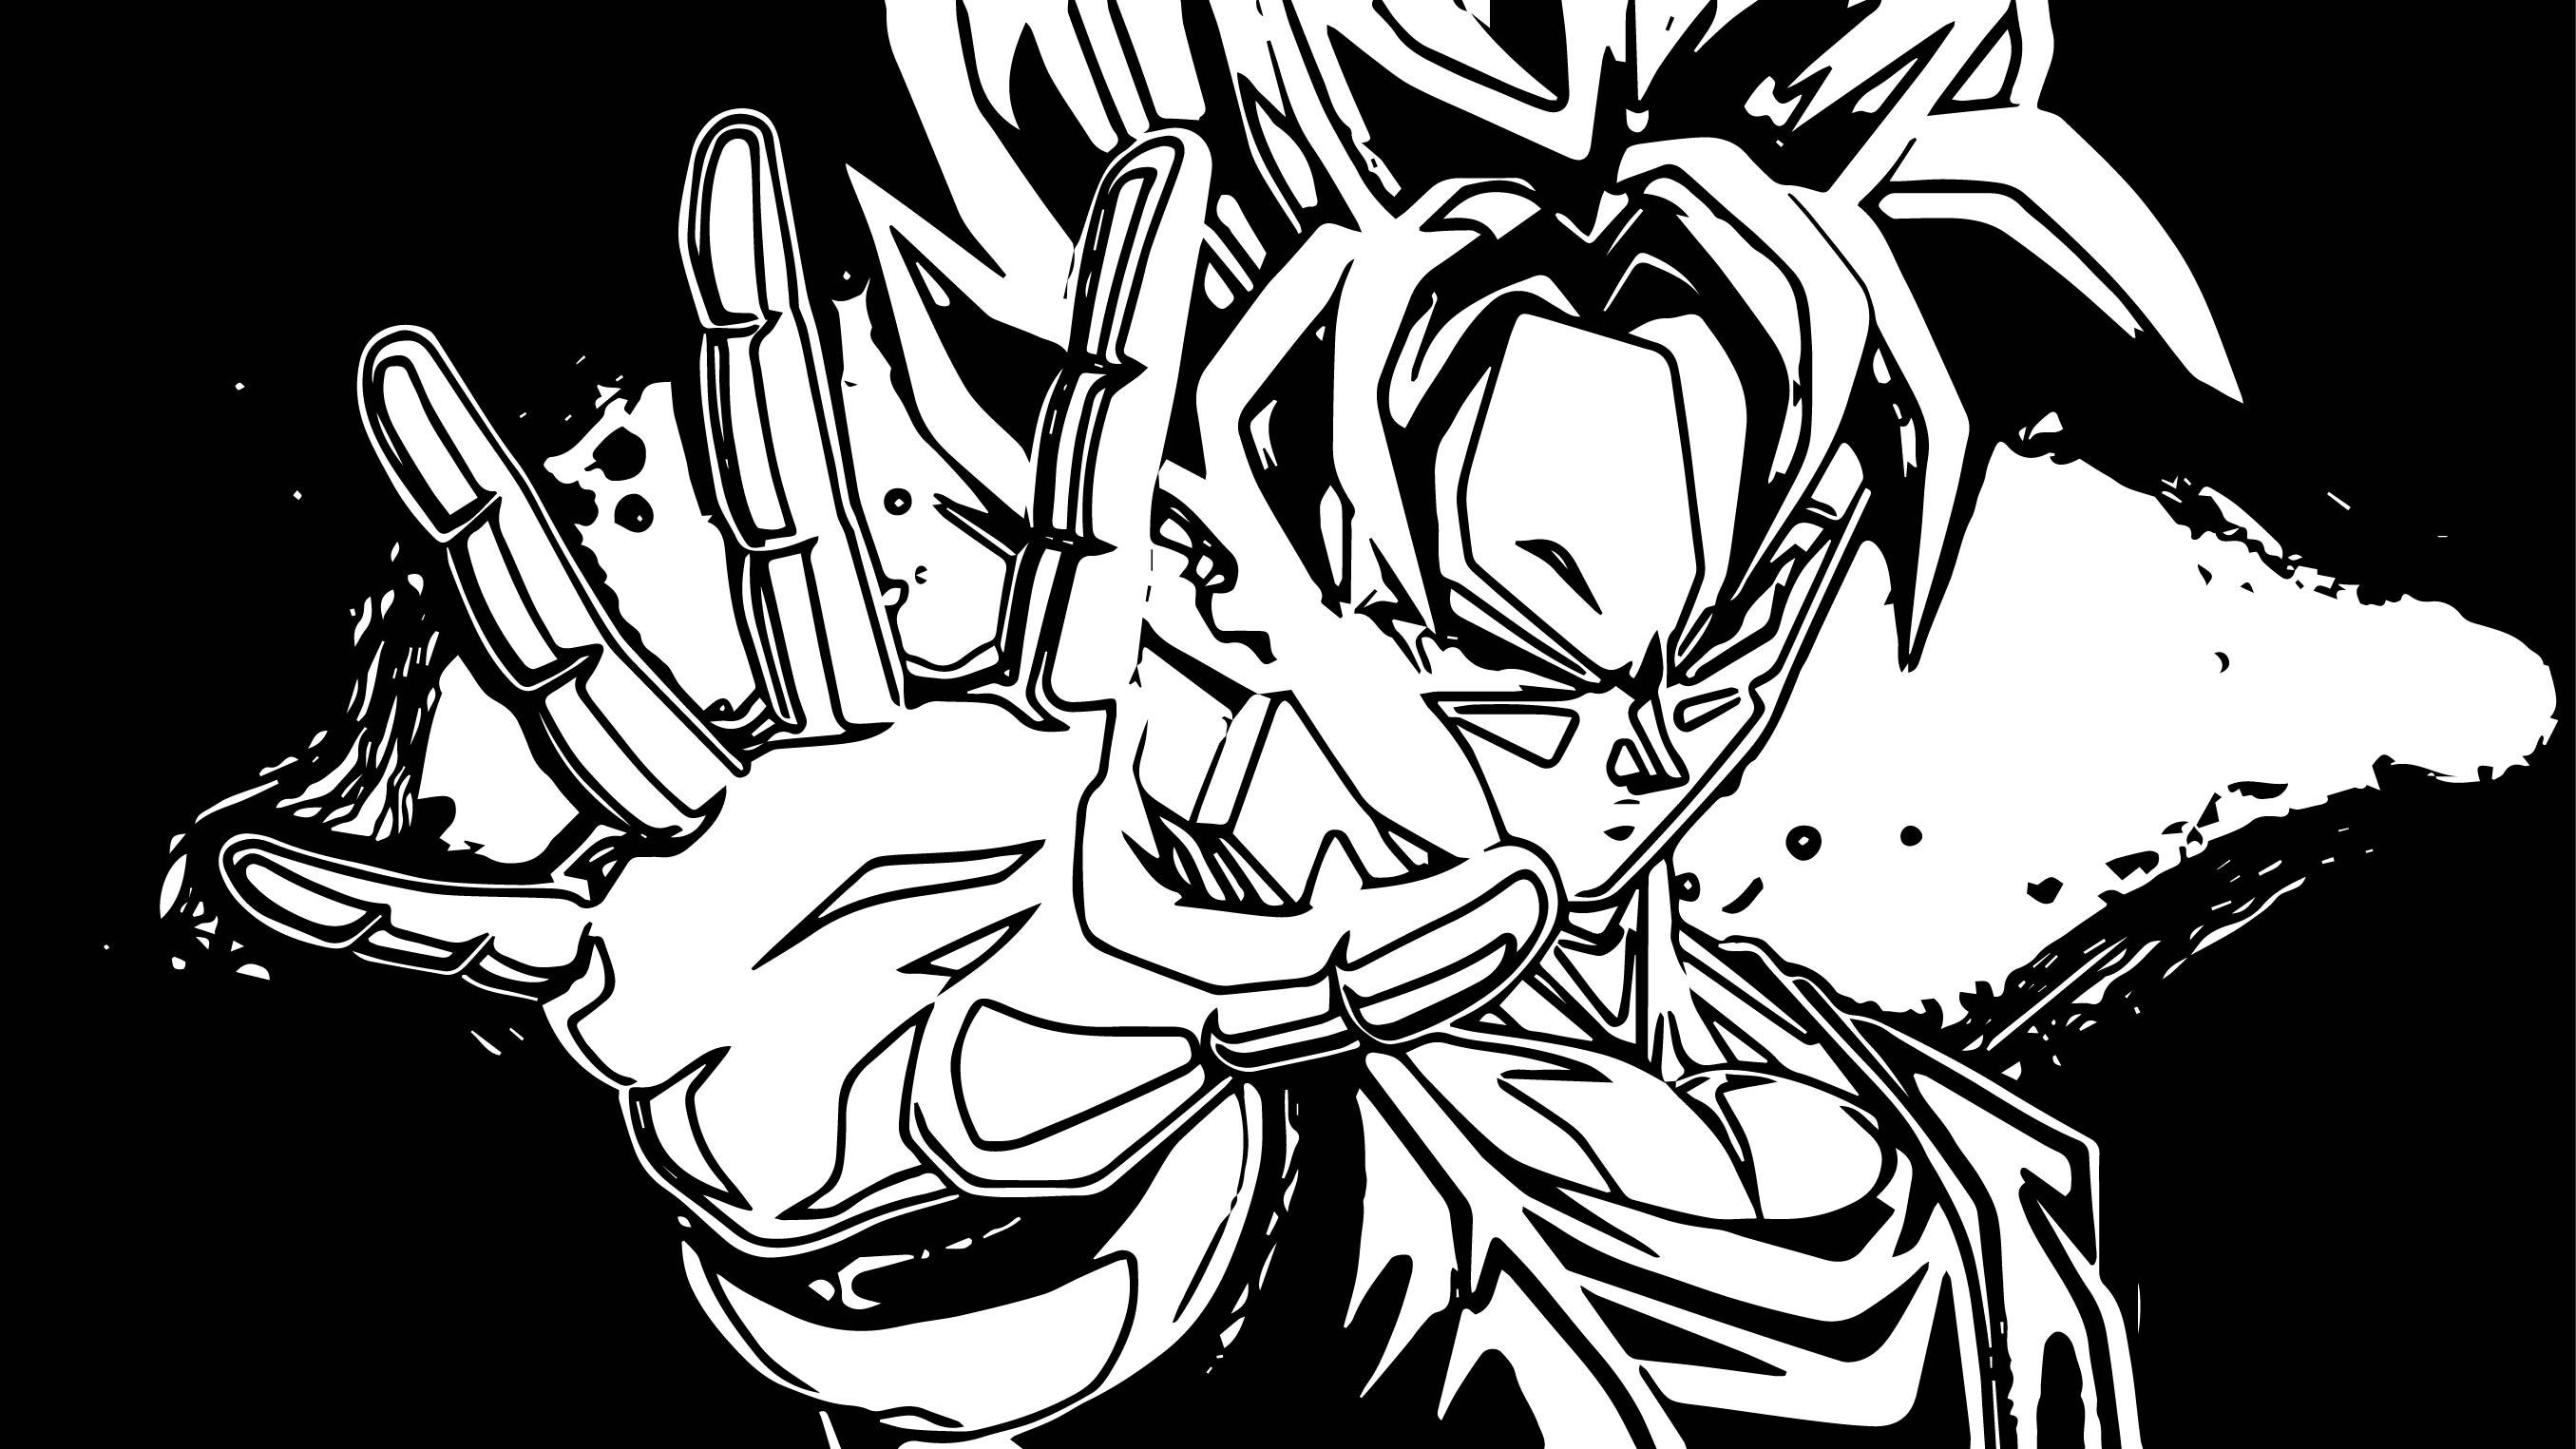 Goku We Coloring Page 207